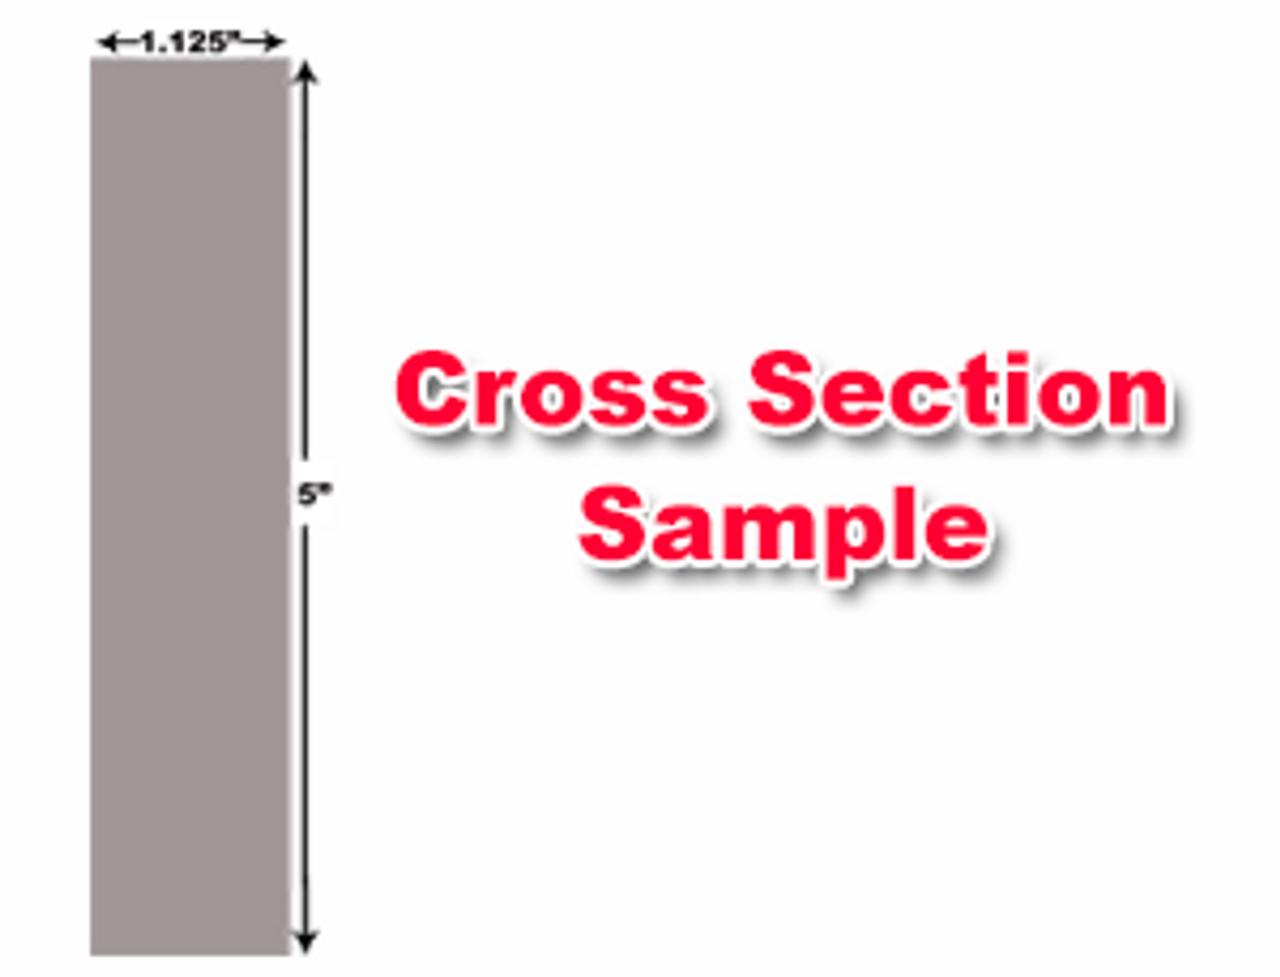 "Cincinnati Shear Knives - 124"" Length, 5"" x 1.125"" Cross Section (239331) Type D"